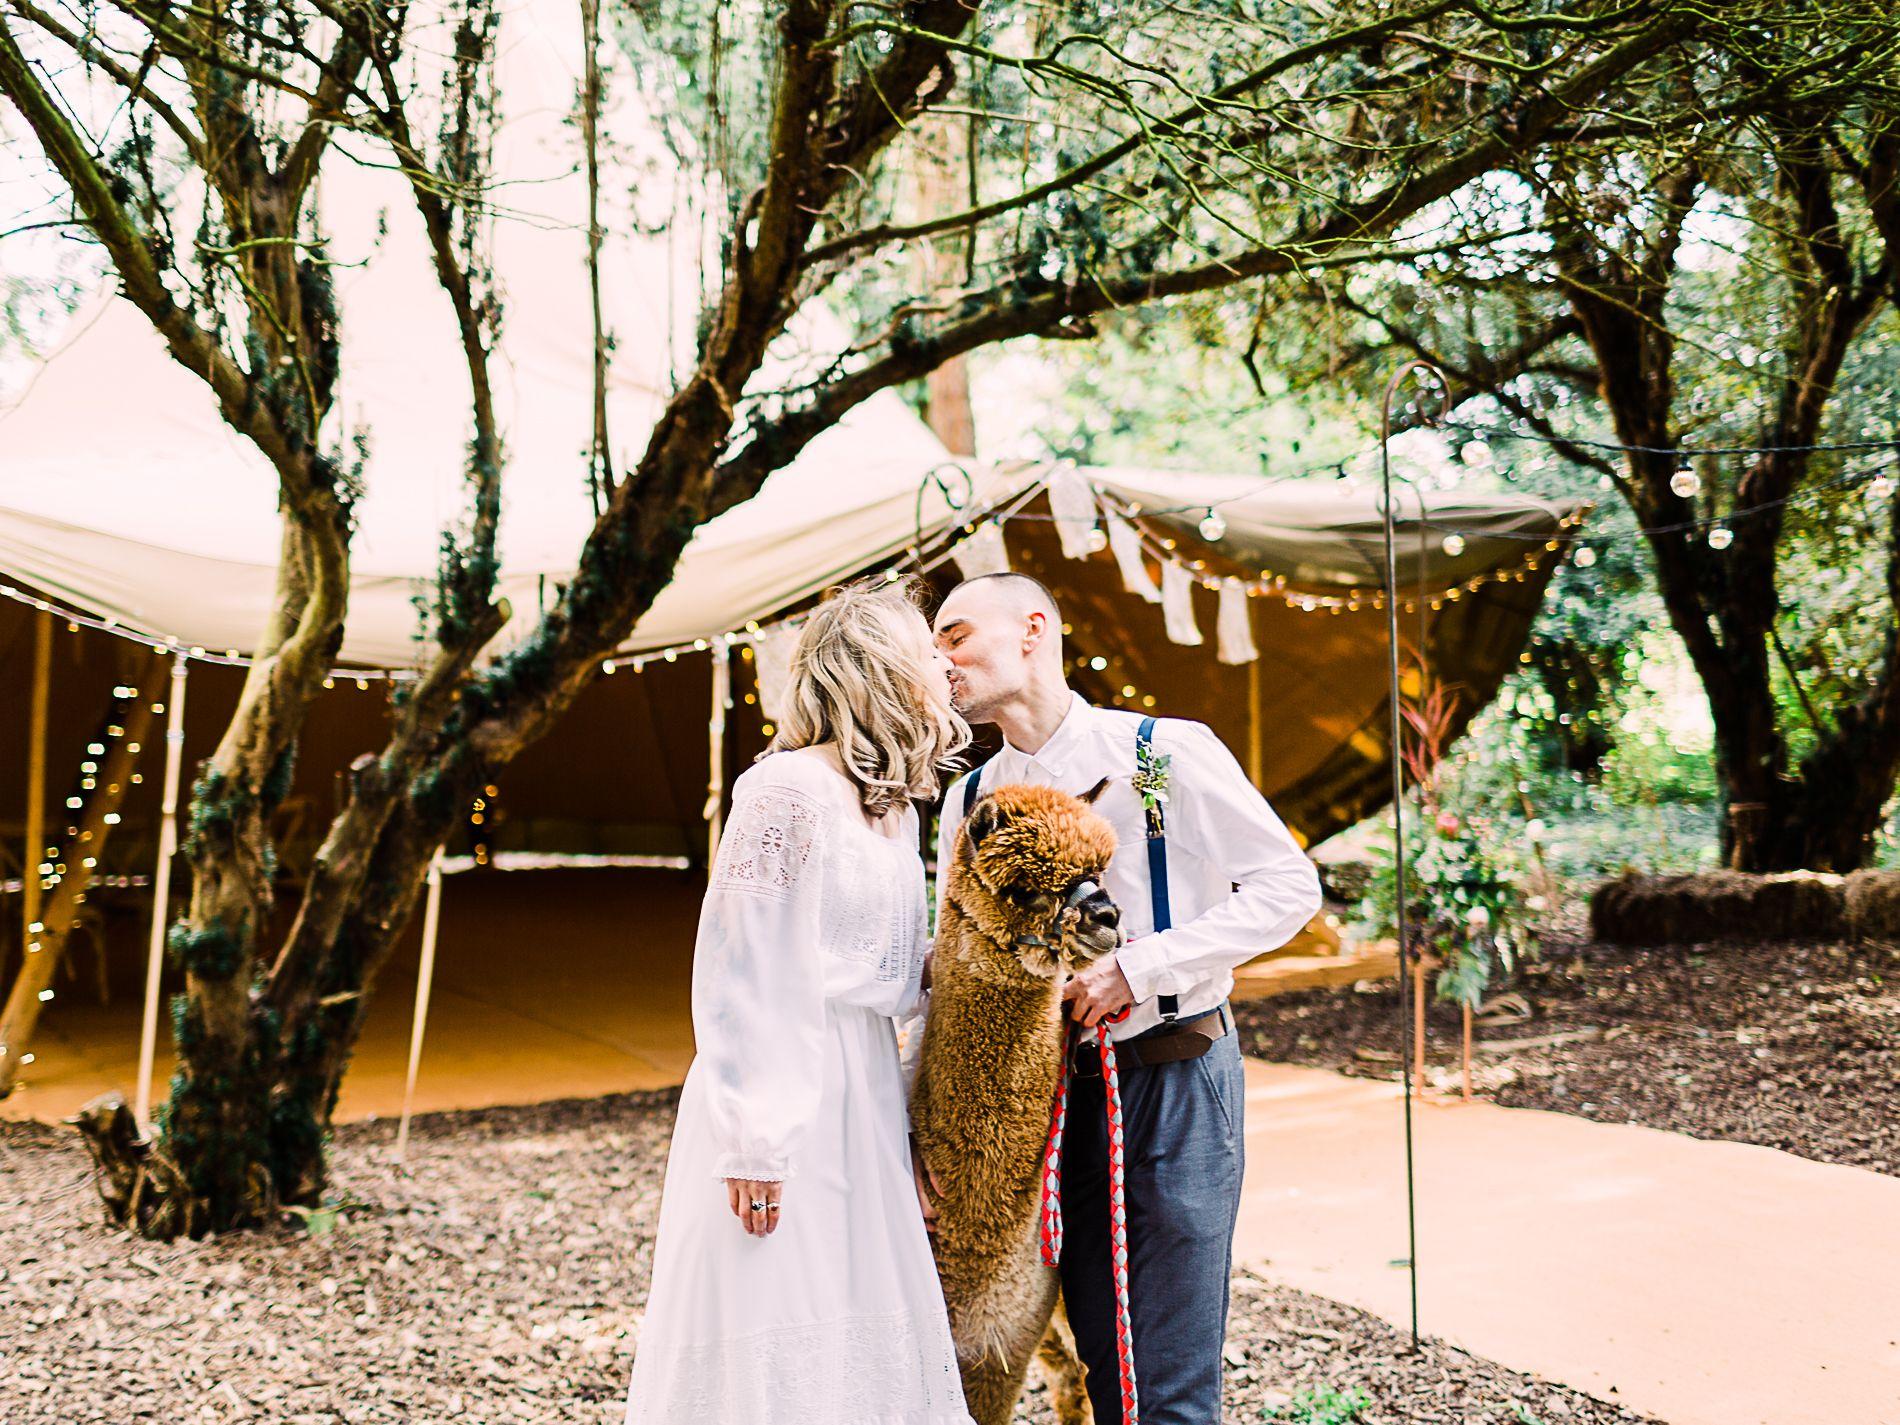 Wedding_Photography_Becky_Tranter-39